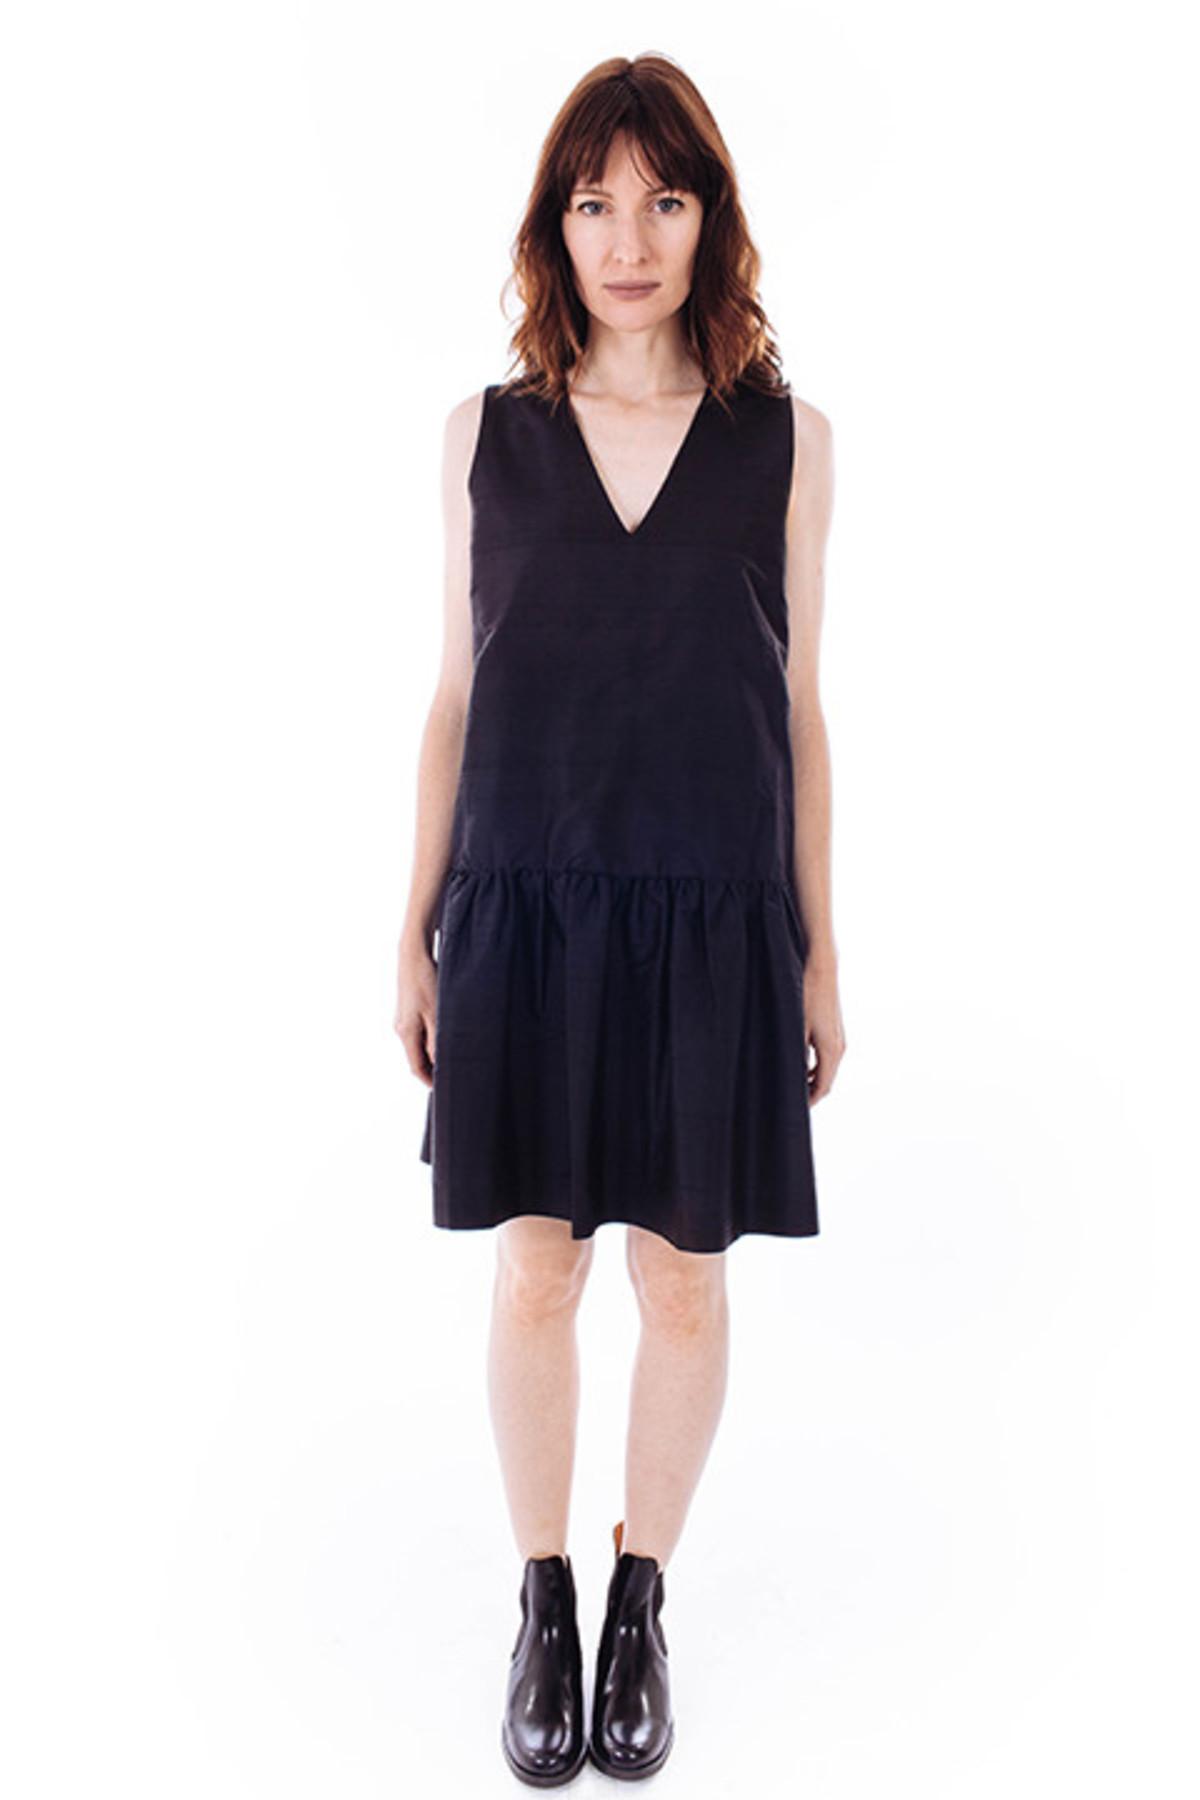 Galerry slip dress fabric